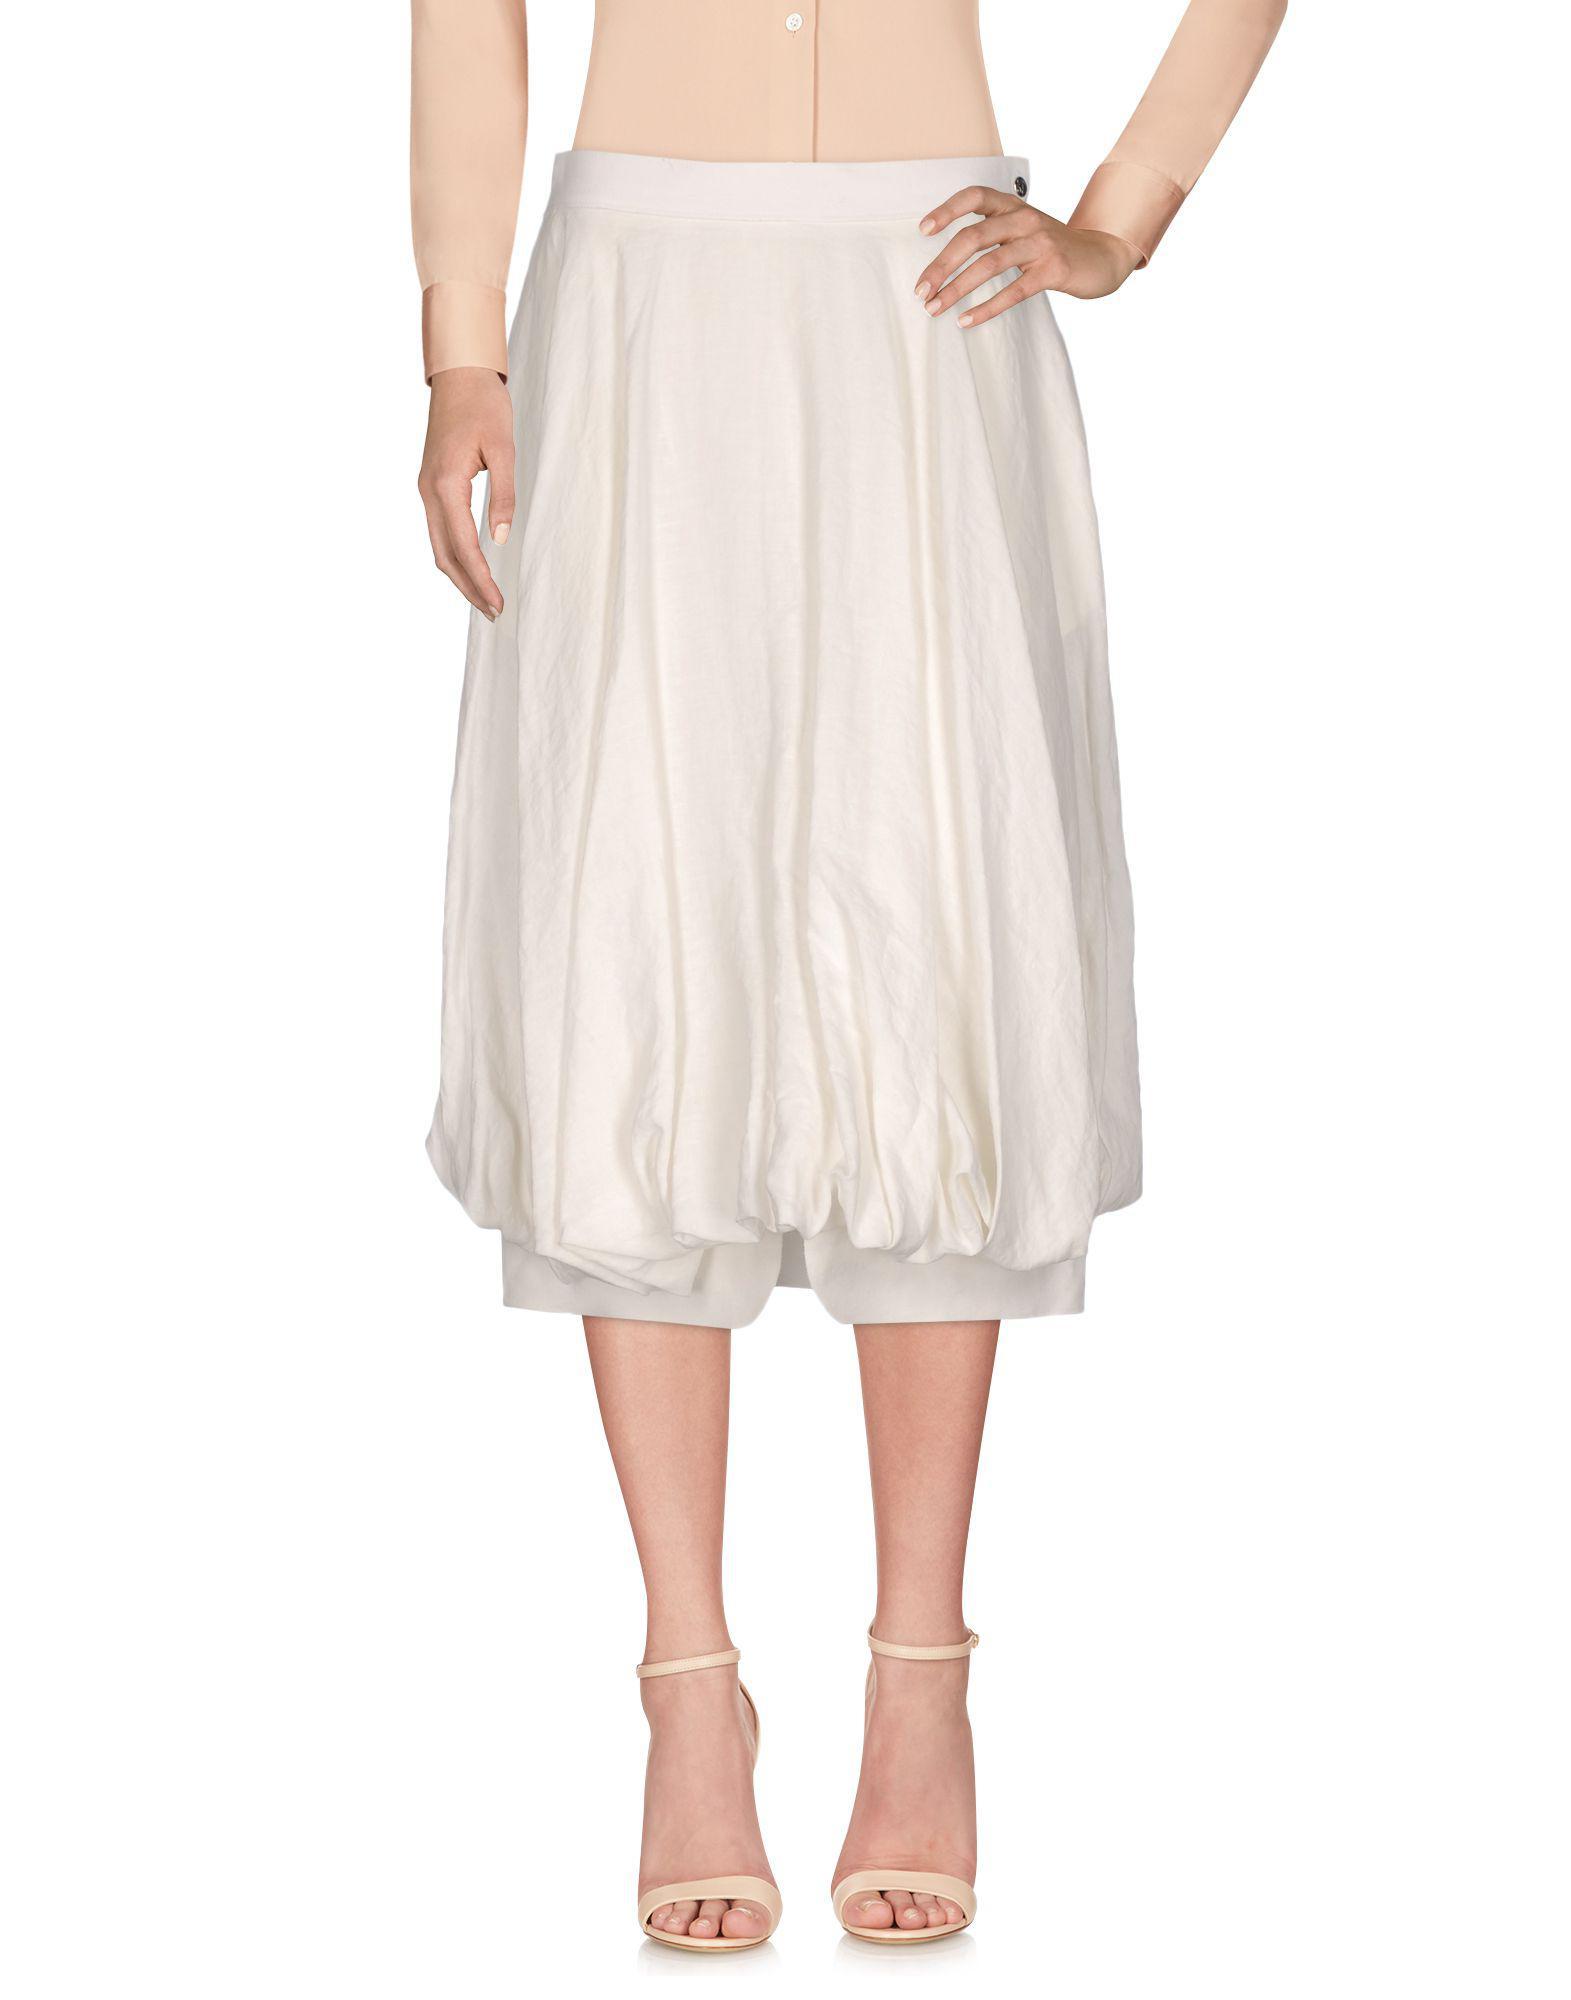 4a28c906d8c3 Loewe 3/4 Length Skirt in White - Lyst